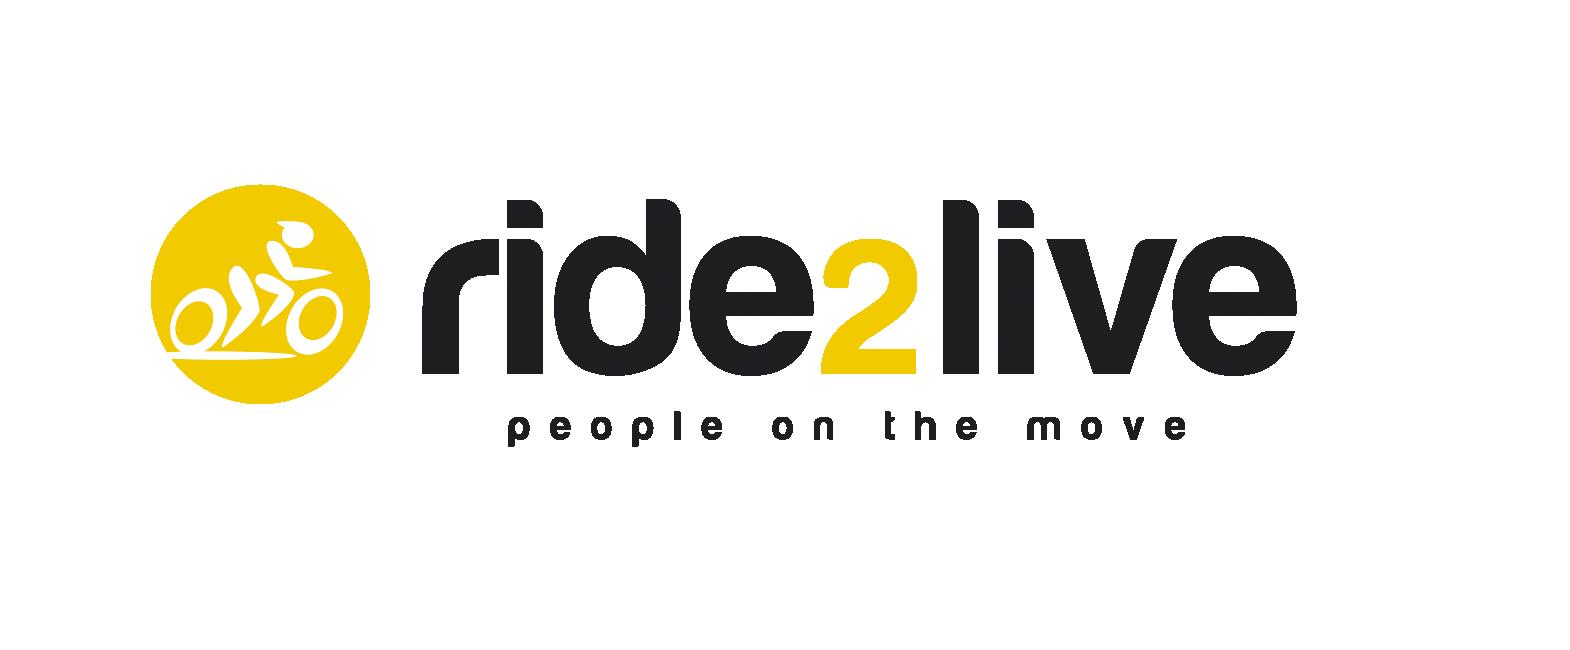 Ride2live